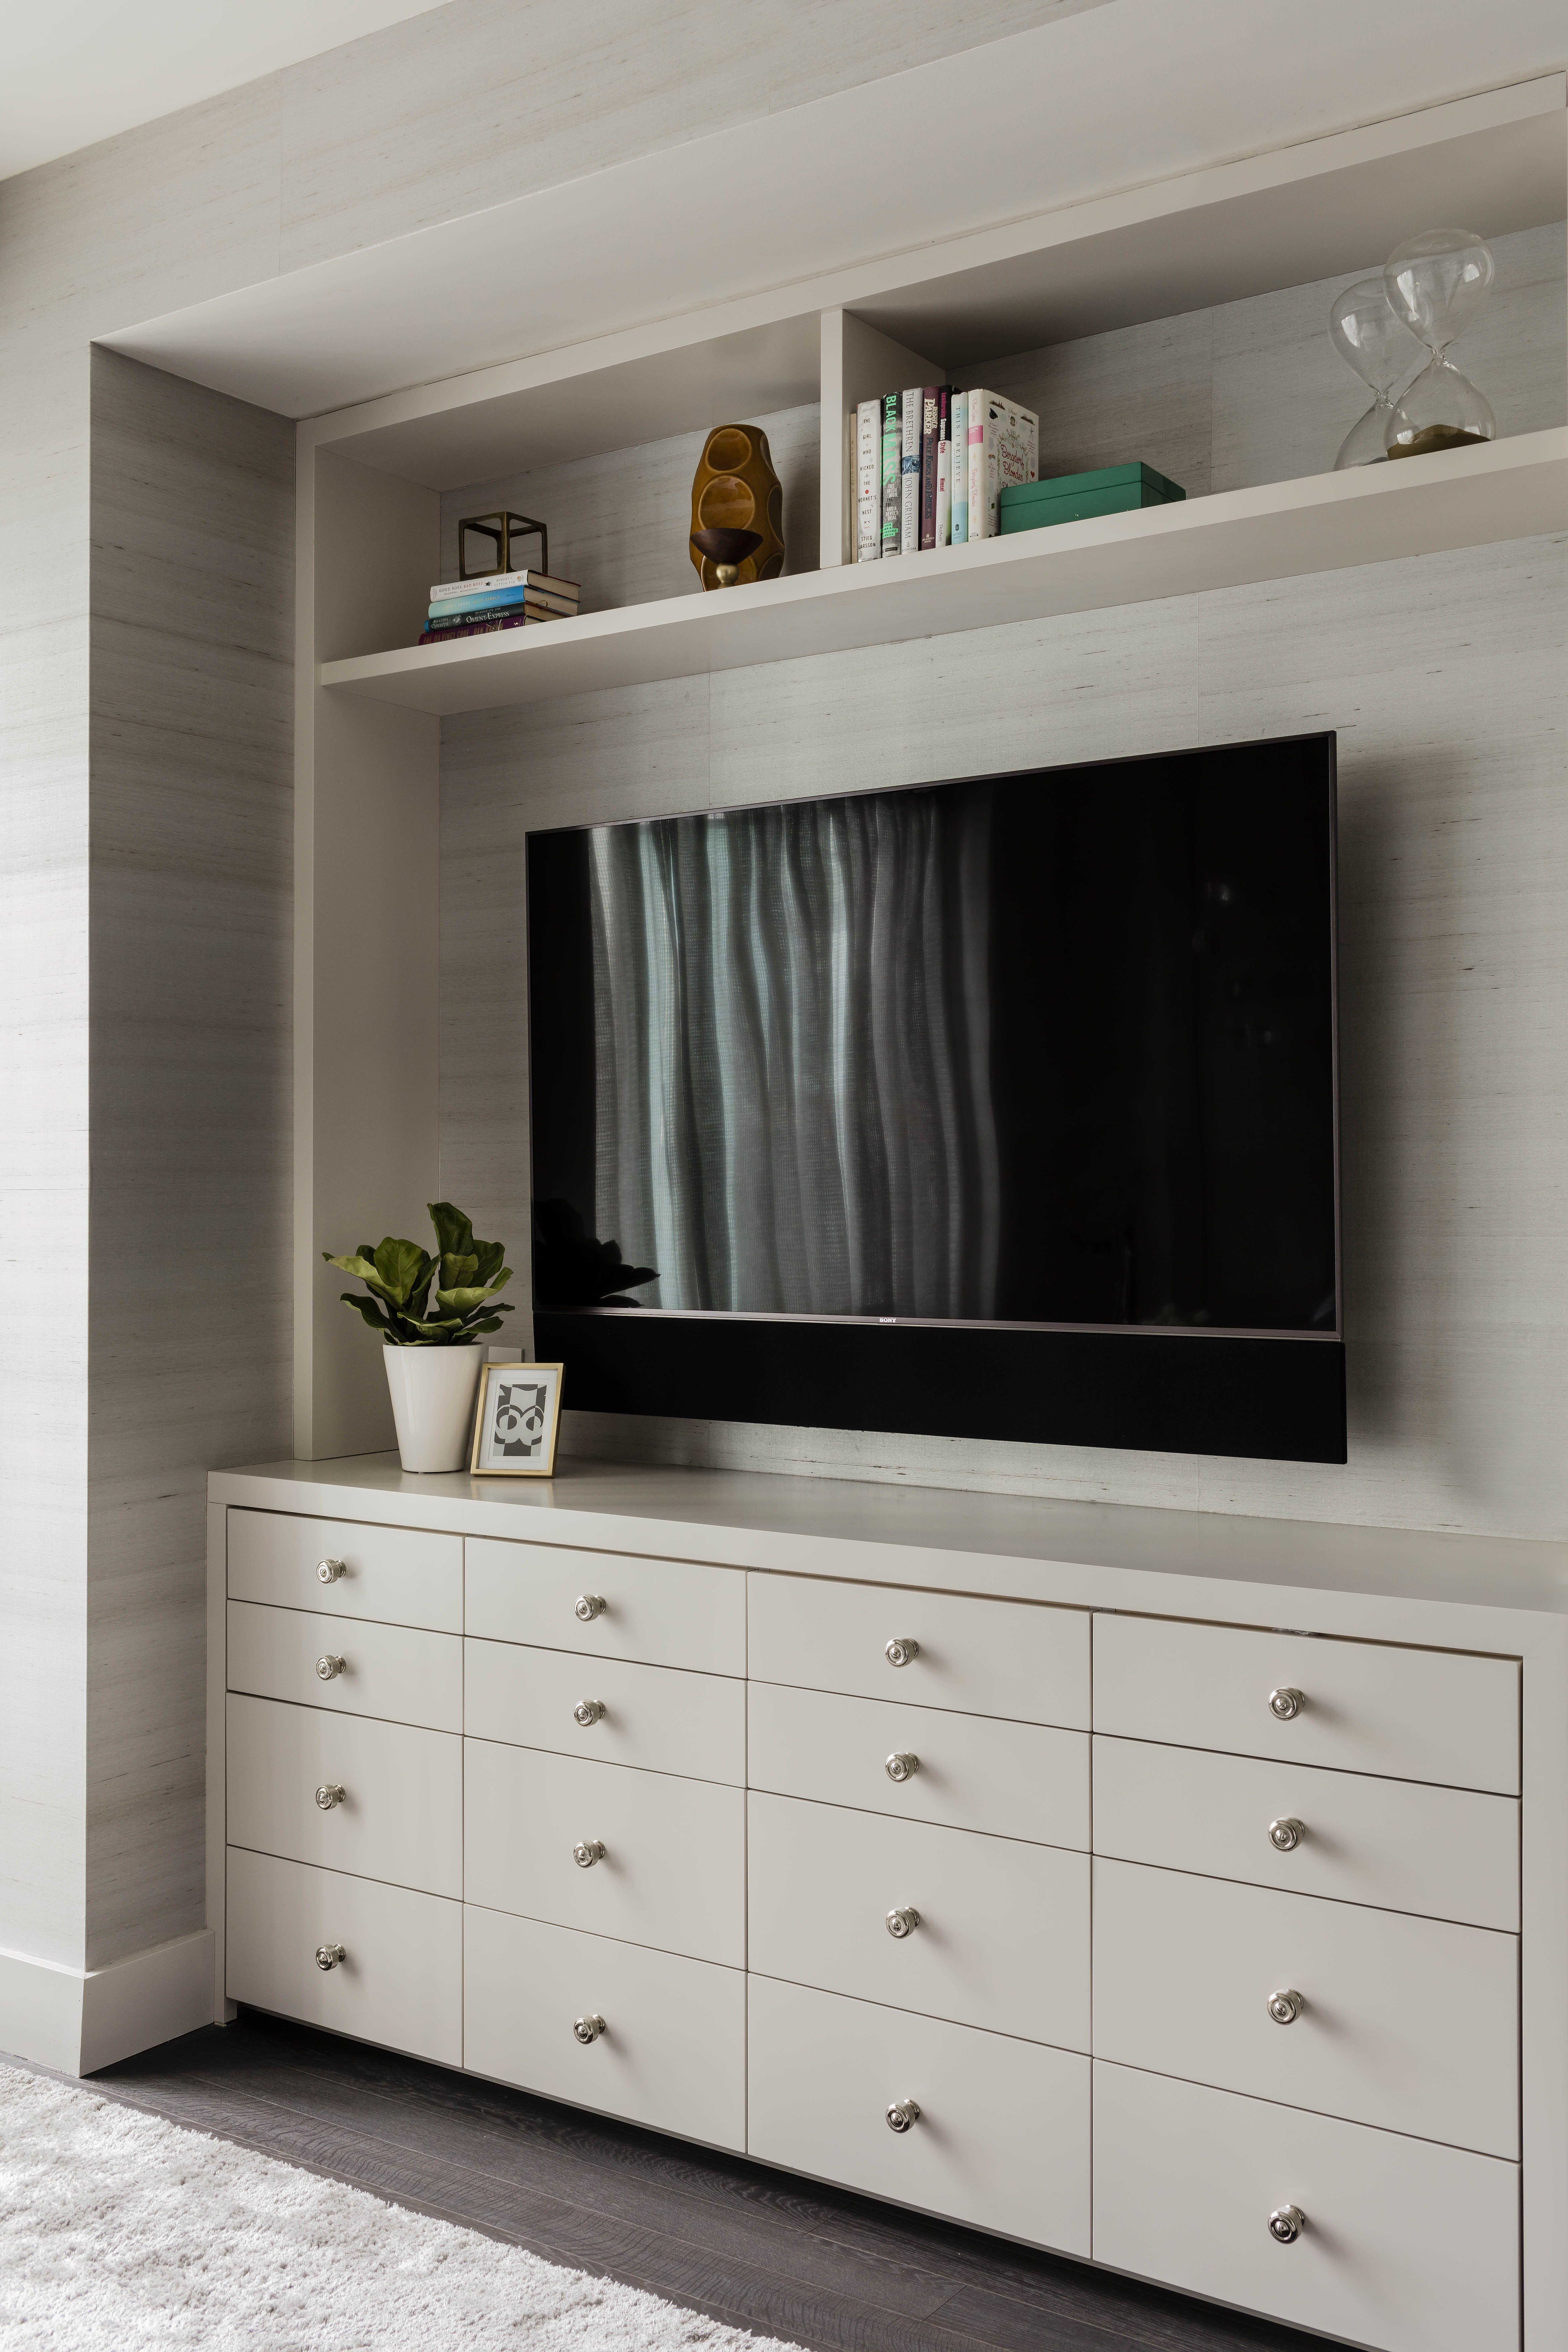 50 Liberty 2 Elms Interior Design Master Bedroom With Built In